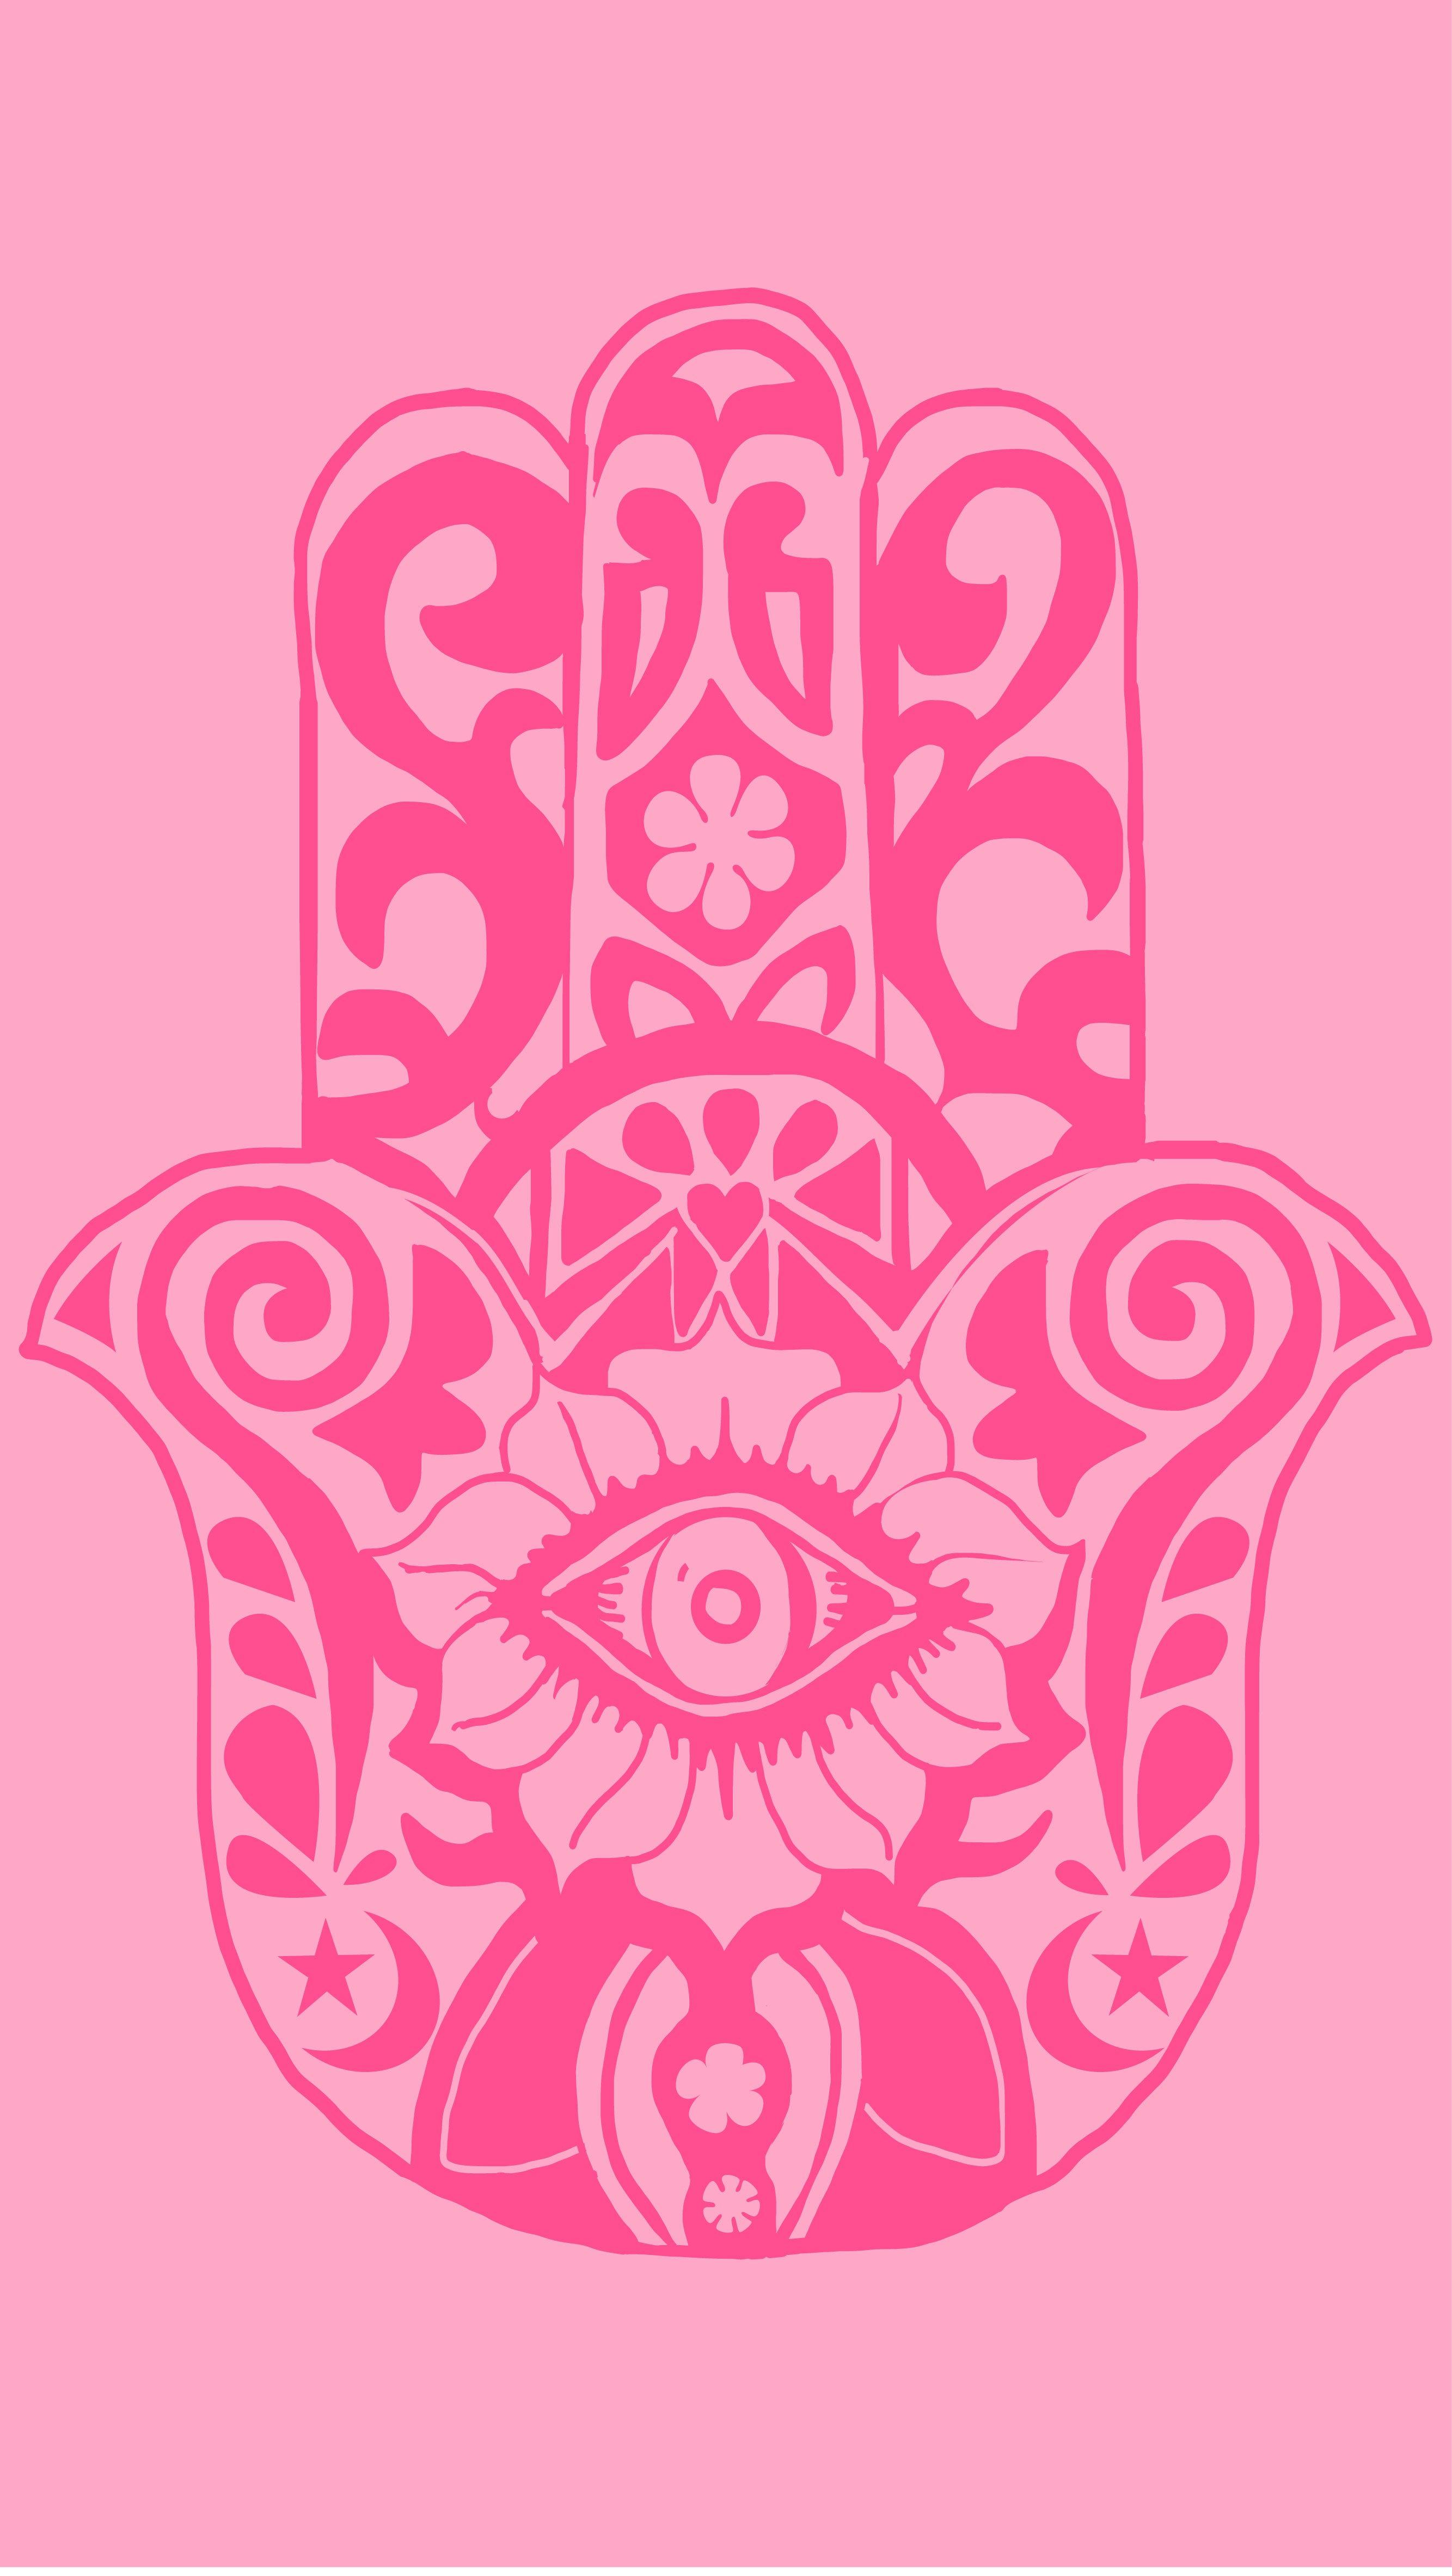 wallpaper tumblr iphone 5   Wallpapers 2667x4733